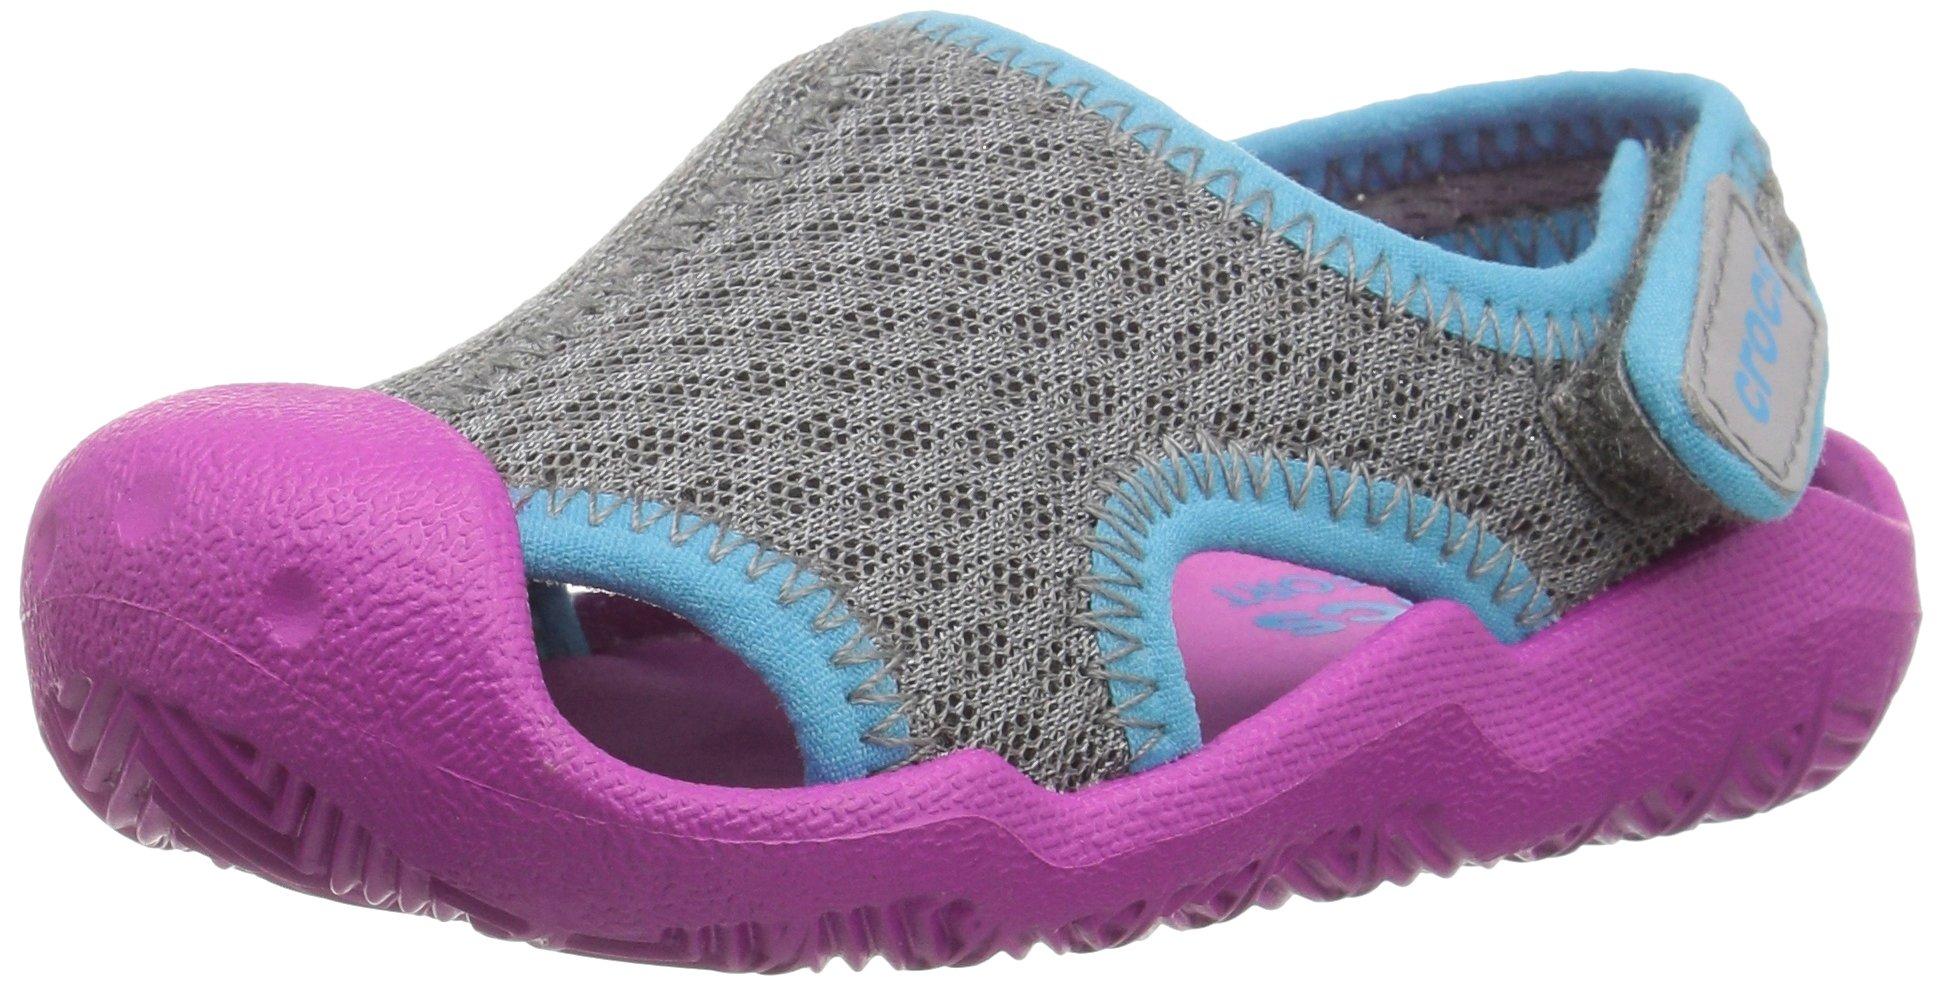 Crocs Kids' Swiftwater Sandal,Smoke/Vibrant Violet,12 M US Little Kid